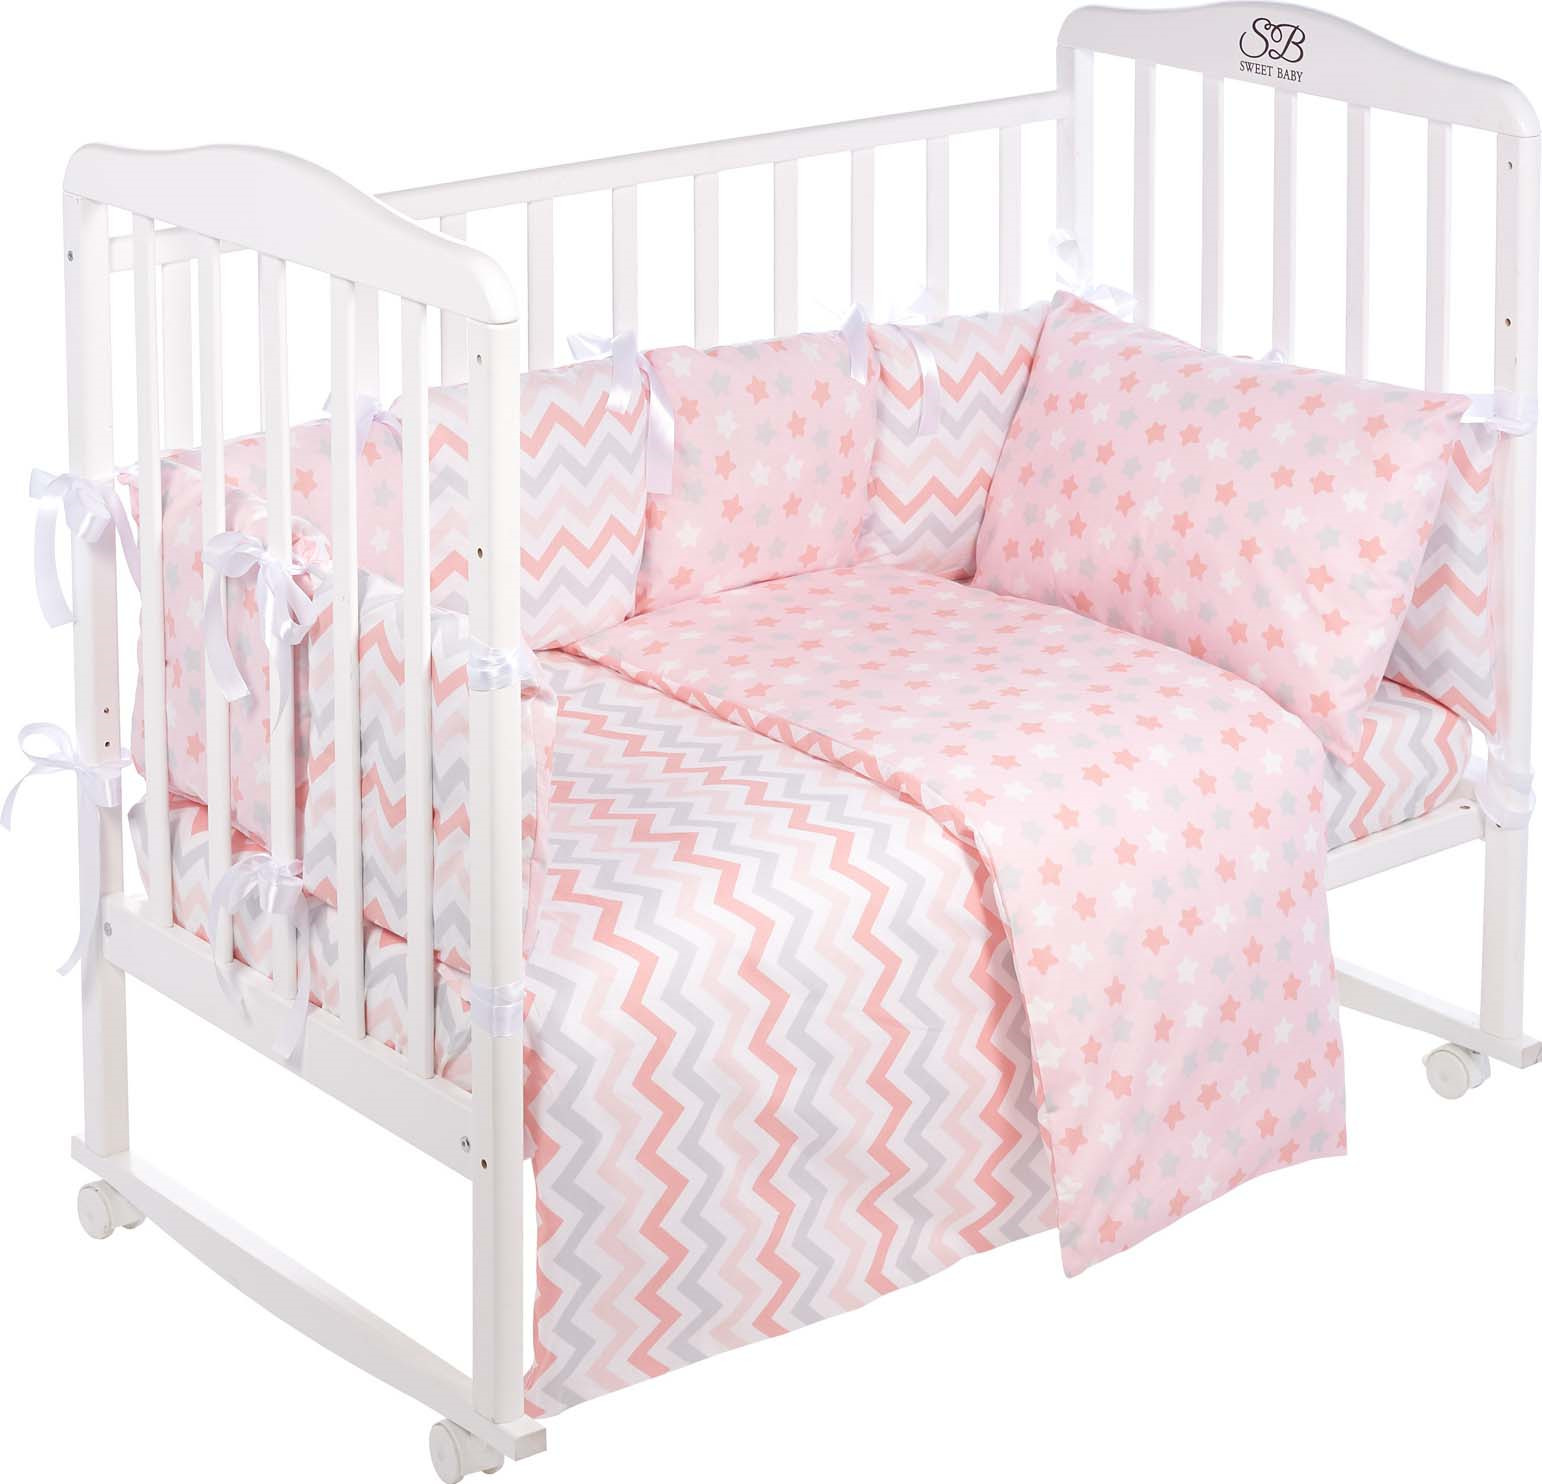 Комплект в кроватку Sweet Baby Anastasia, 419245, розовый, 4 предмета